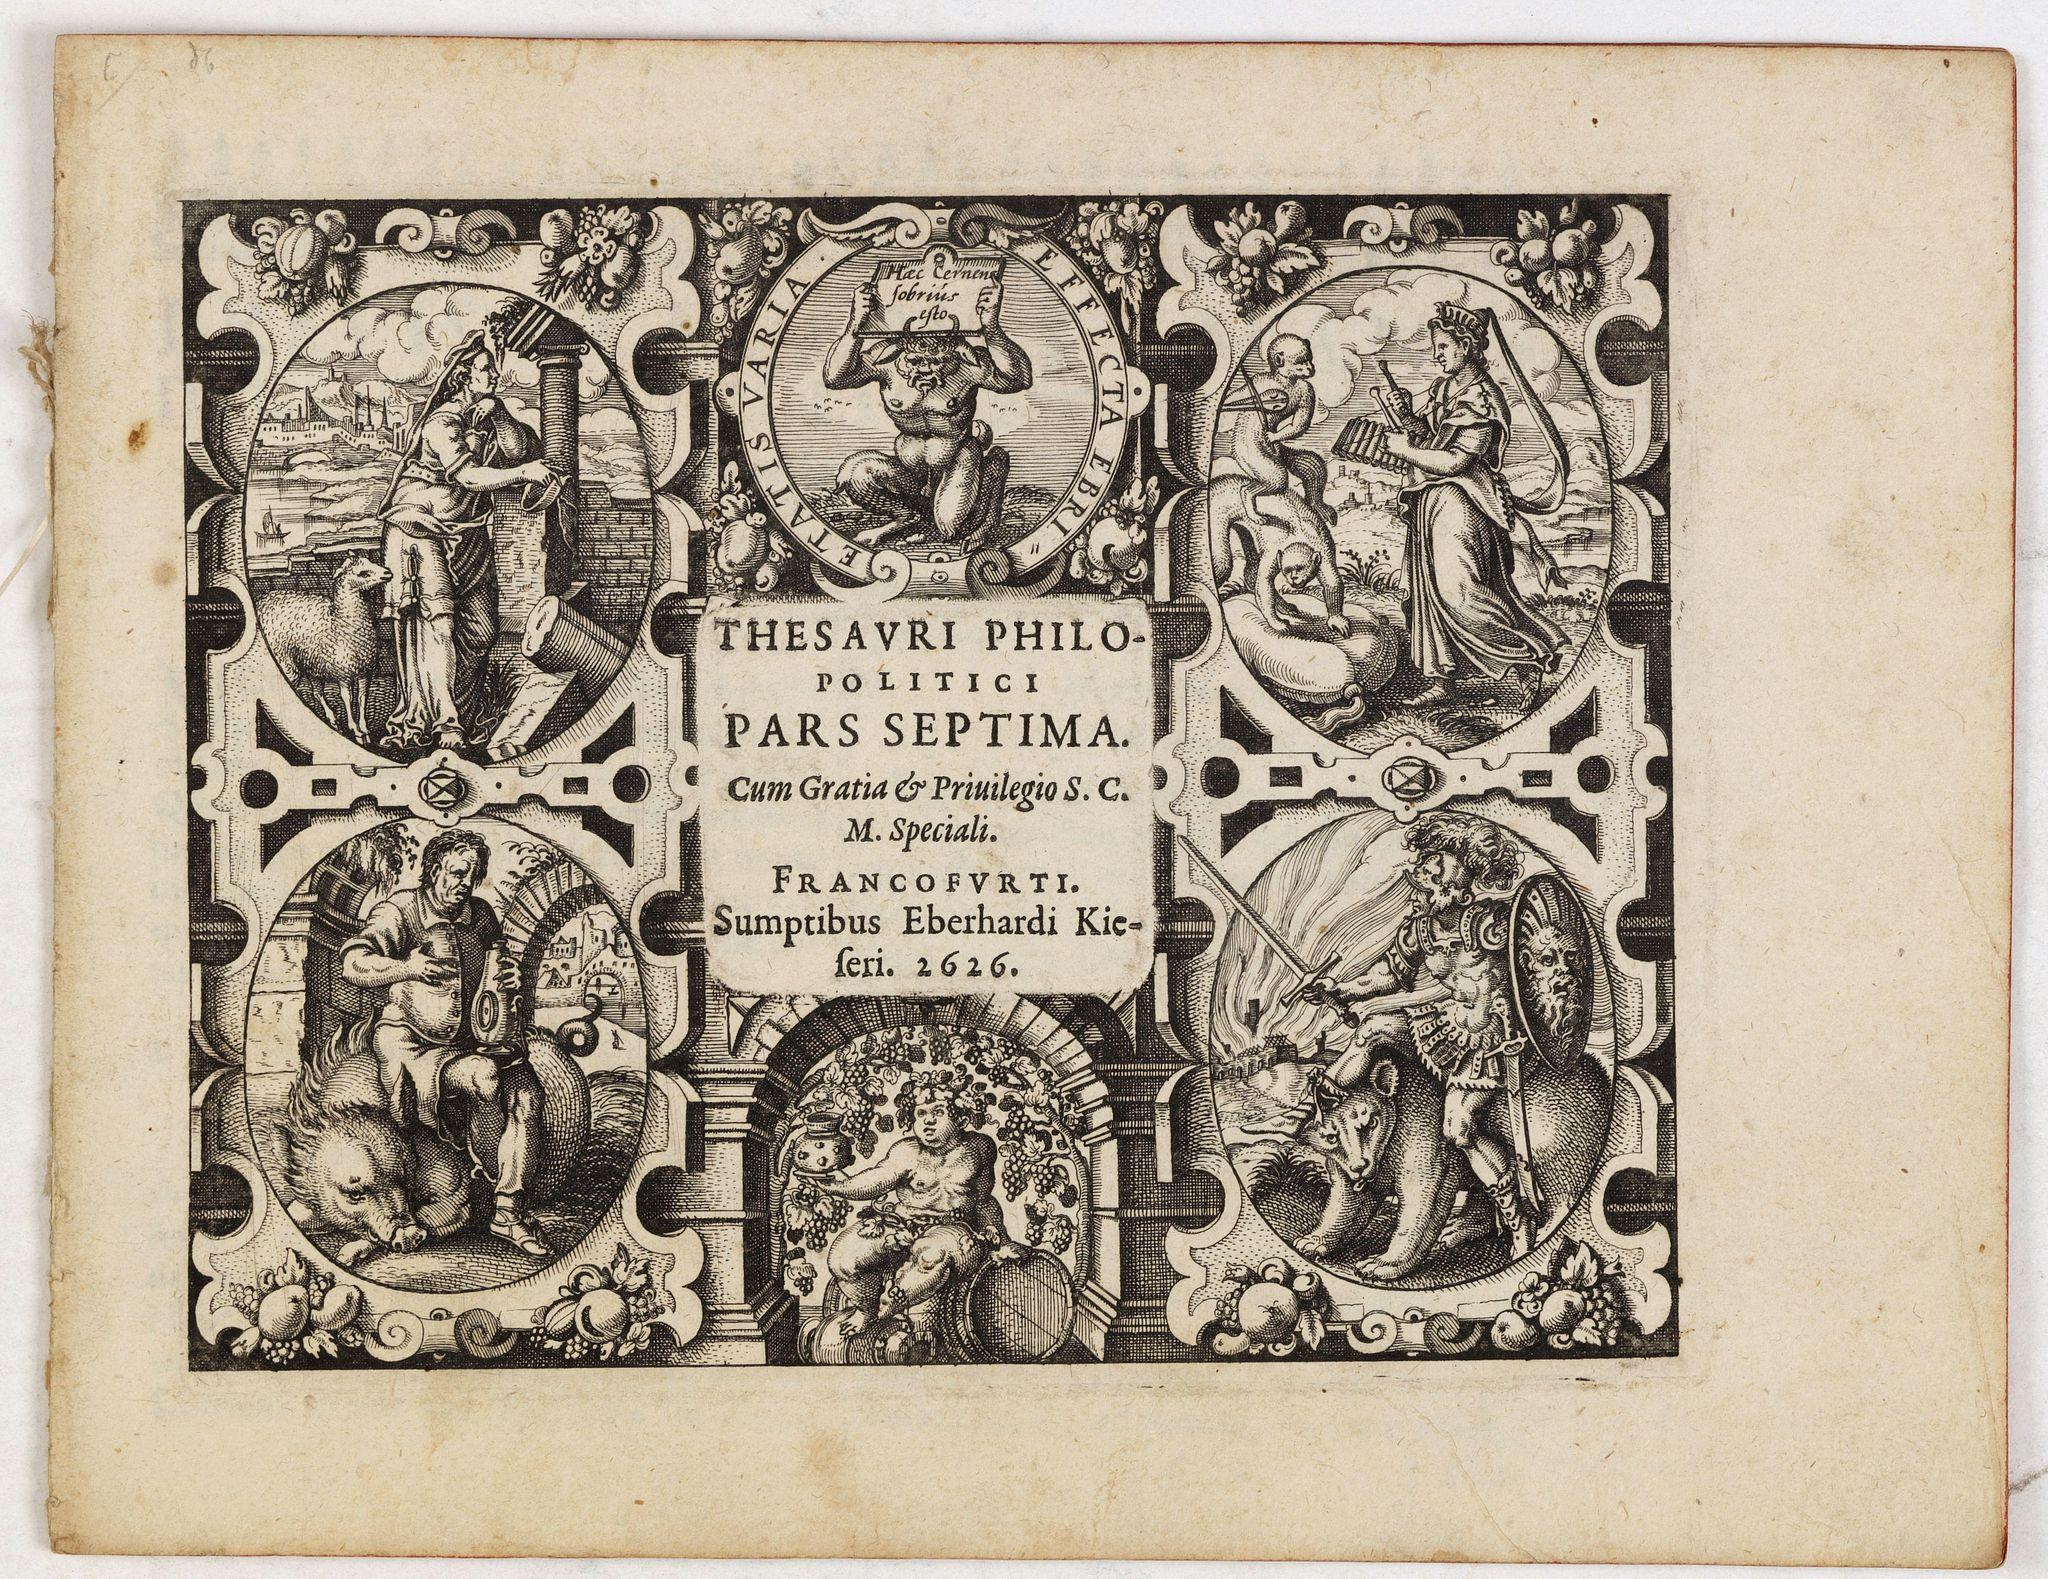 MEISNER, D. -  [Title page] Thesauri Philo Politci pars septima. . .